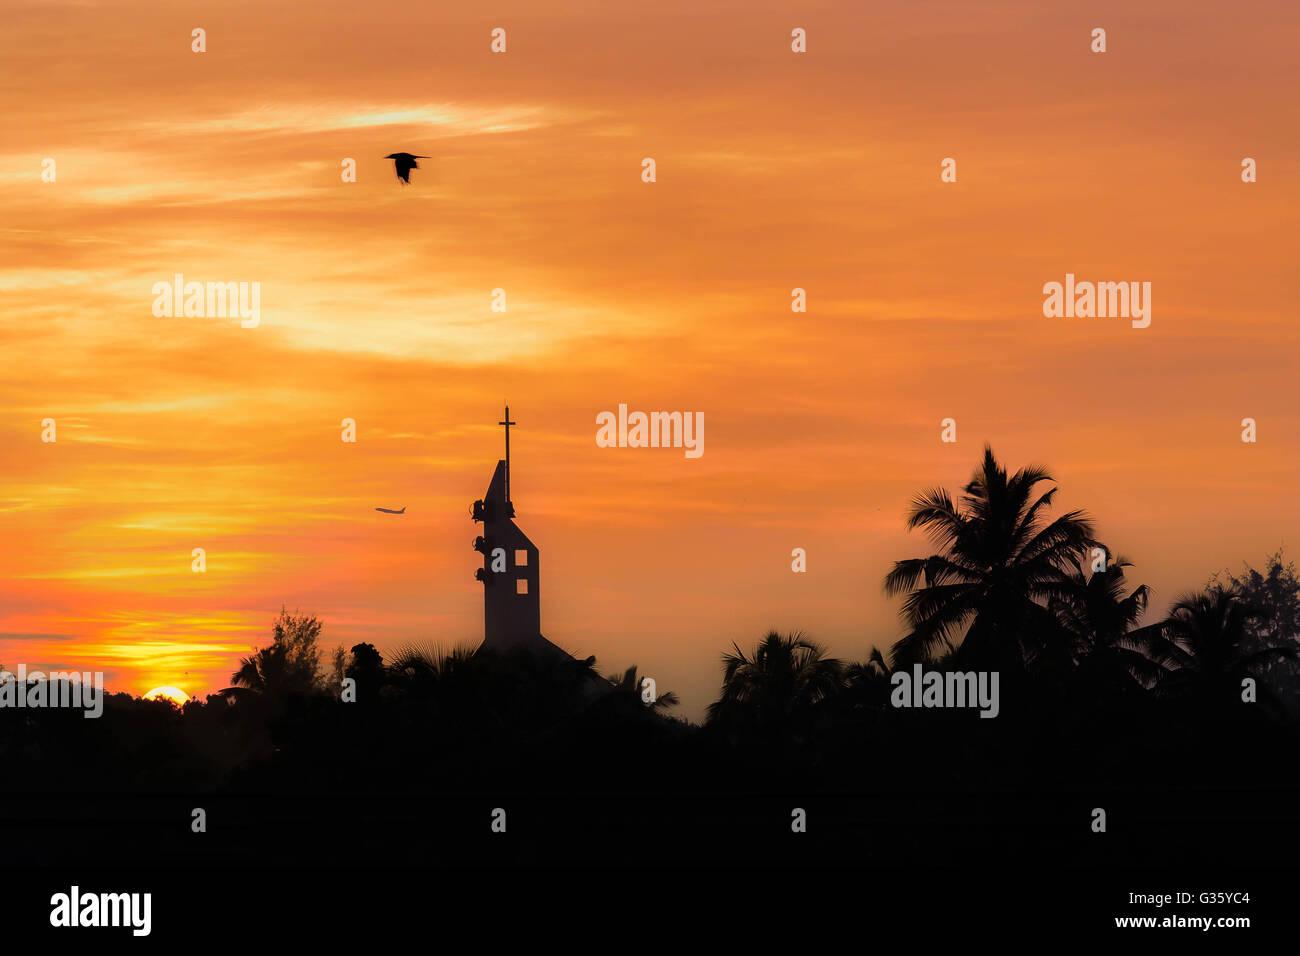 Sunrise, church, bird, airplane, sunset, palmtrees, romantic, Negombo, Sri lanka nature, wake up, early morning, - Stock Image